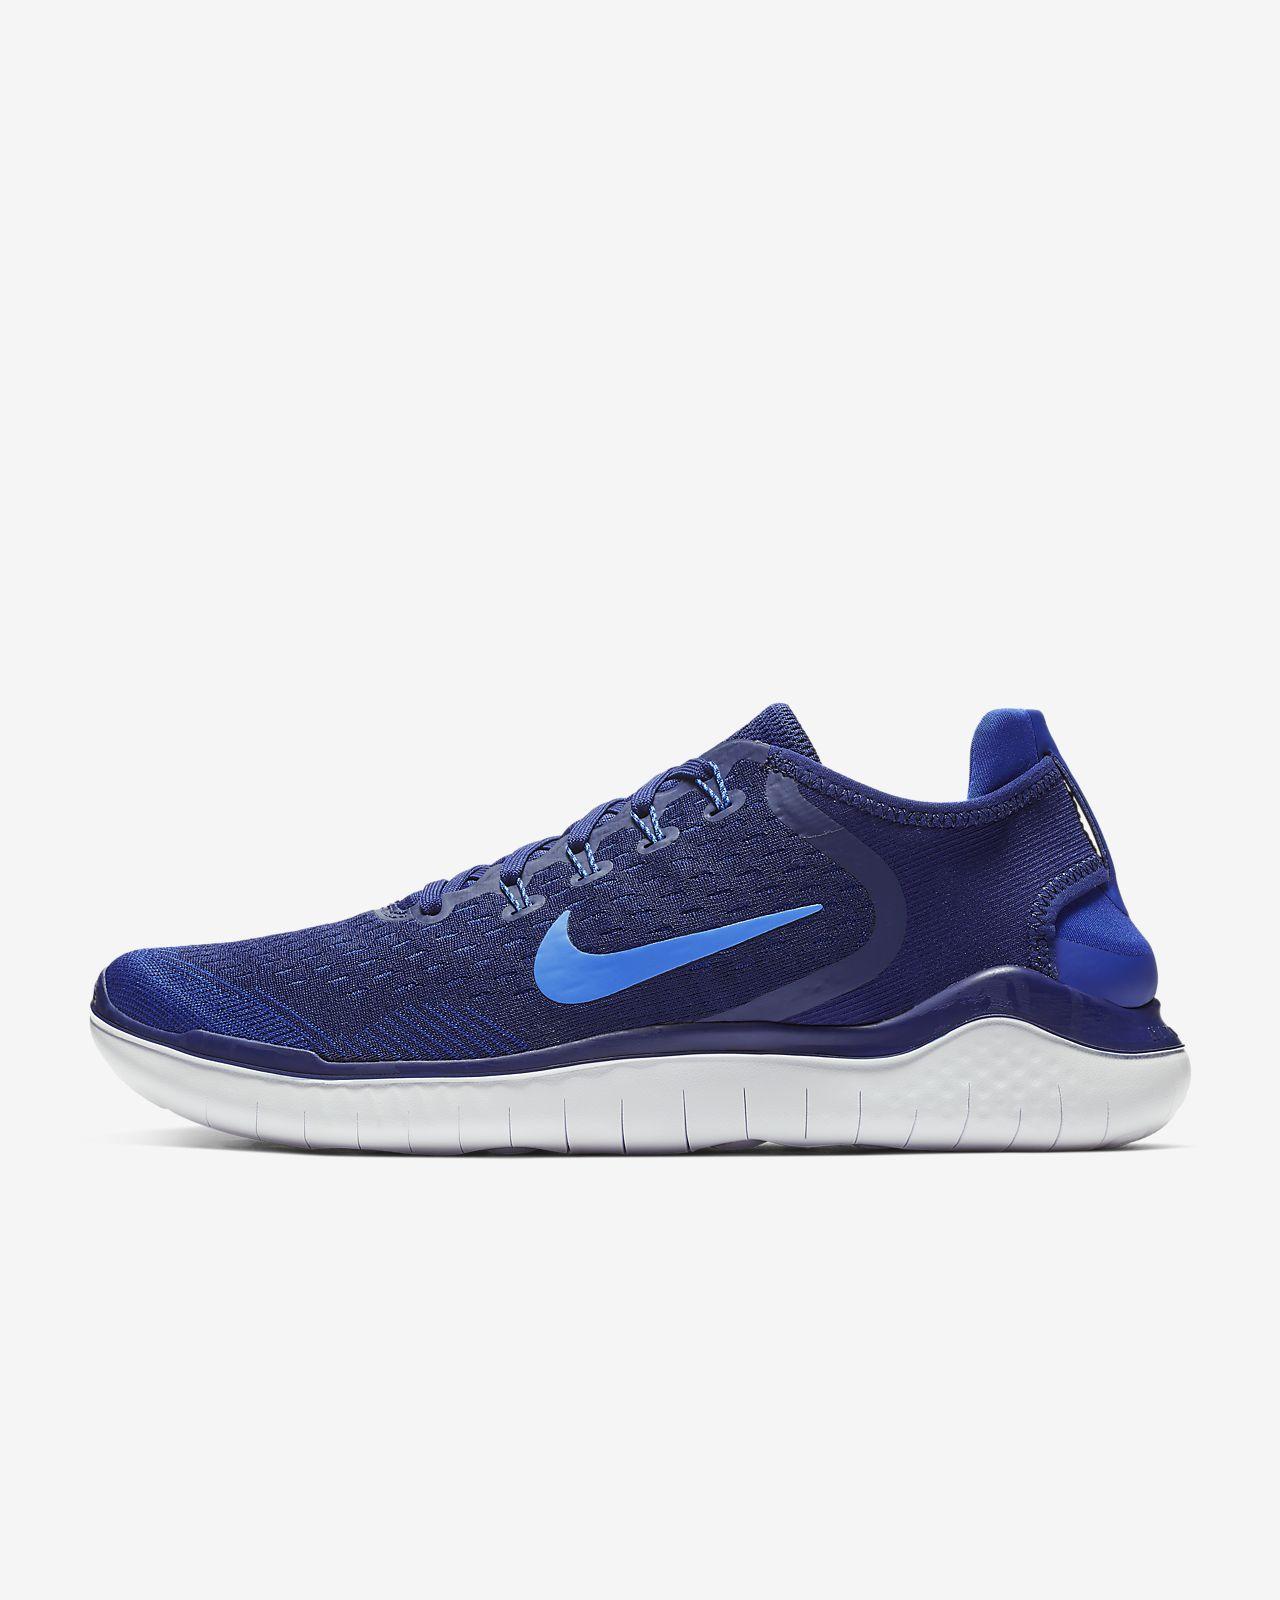 nike free rn 2018 men s running shoe nike com rh nike com